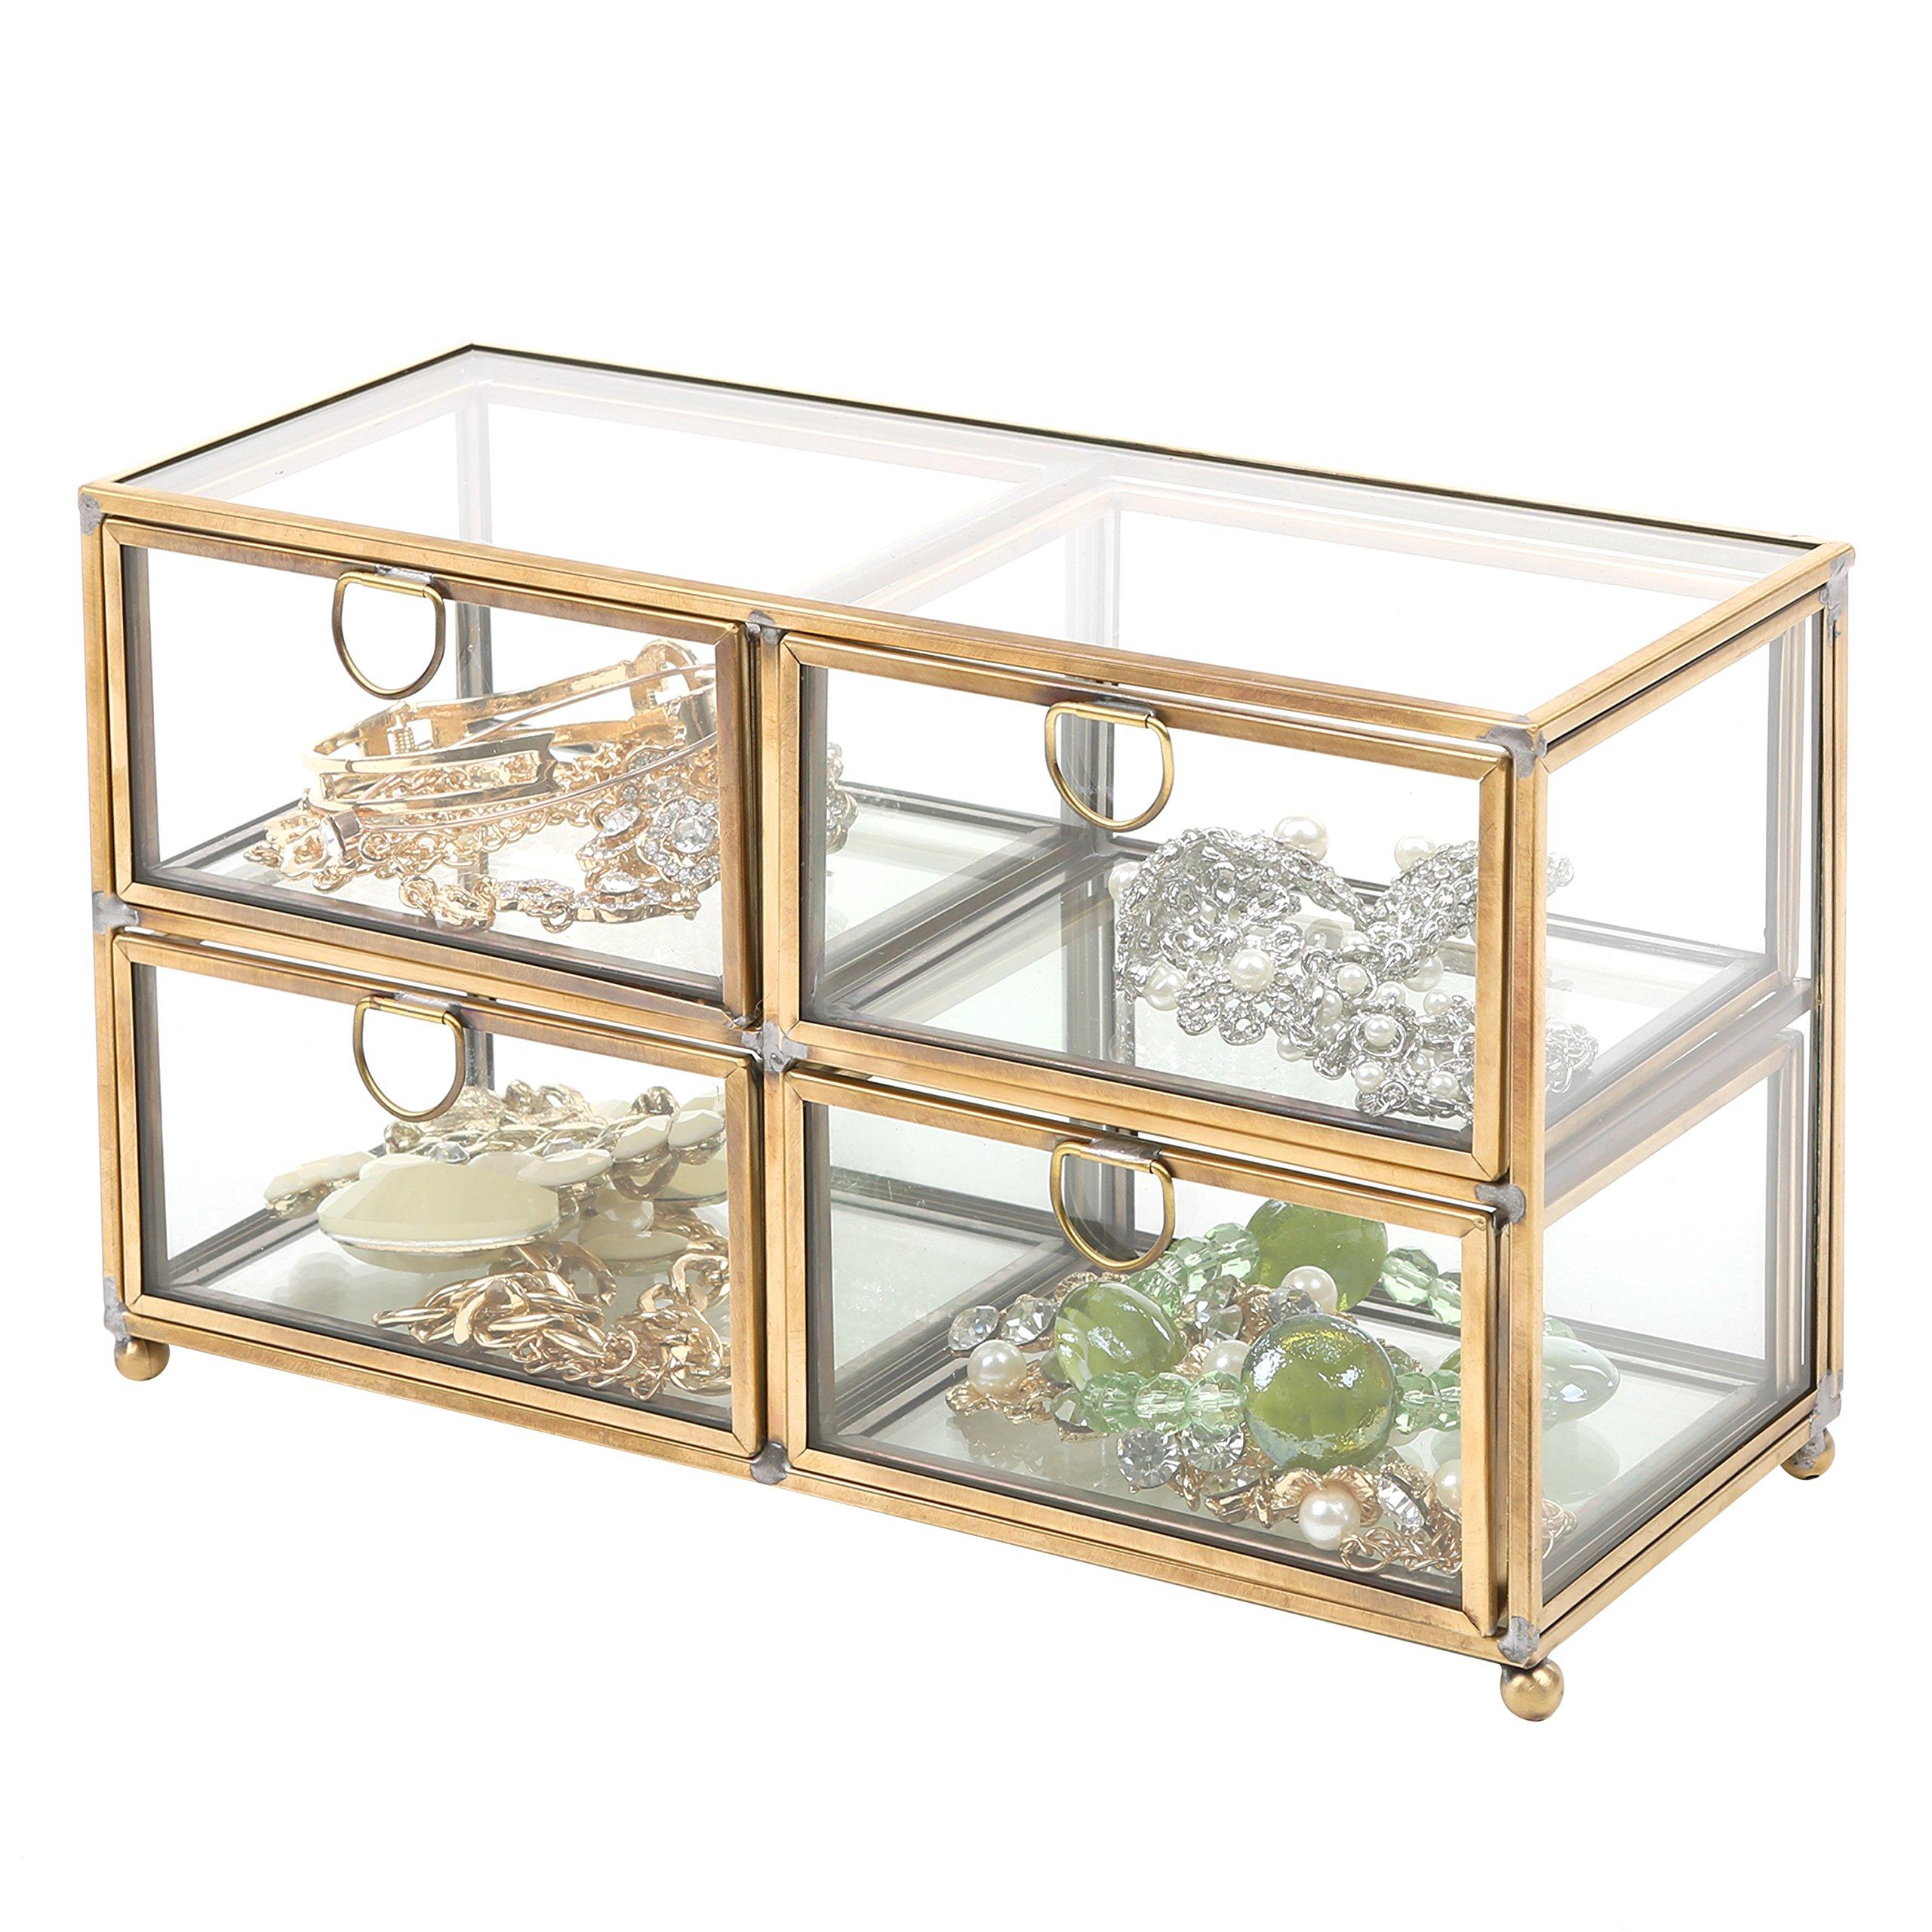 Superior Vintage Clear Glass Brass Metal 4 Drawer Display Box / Dresser Top Jewelry  Storage Organizer   MyGift